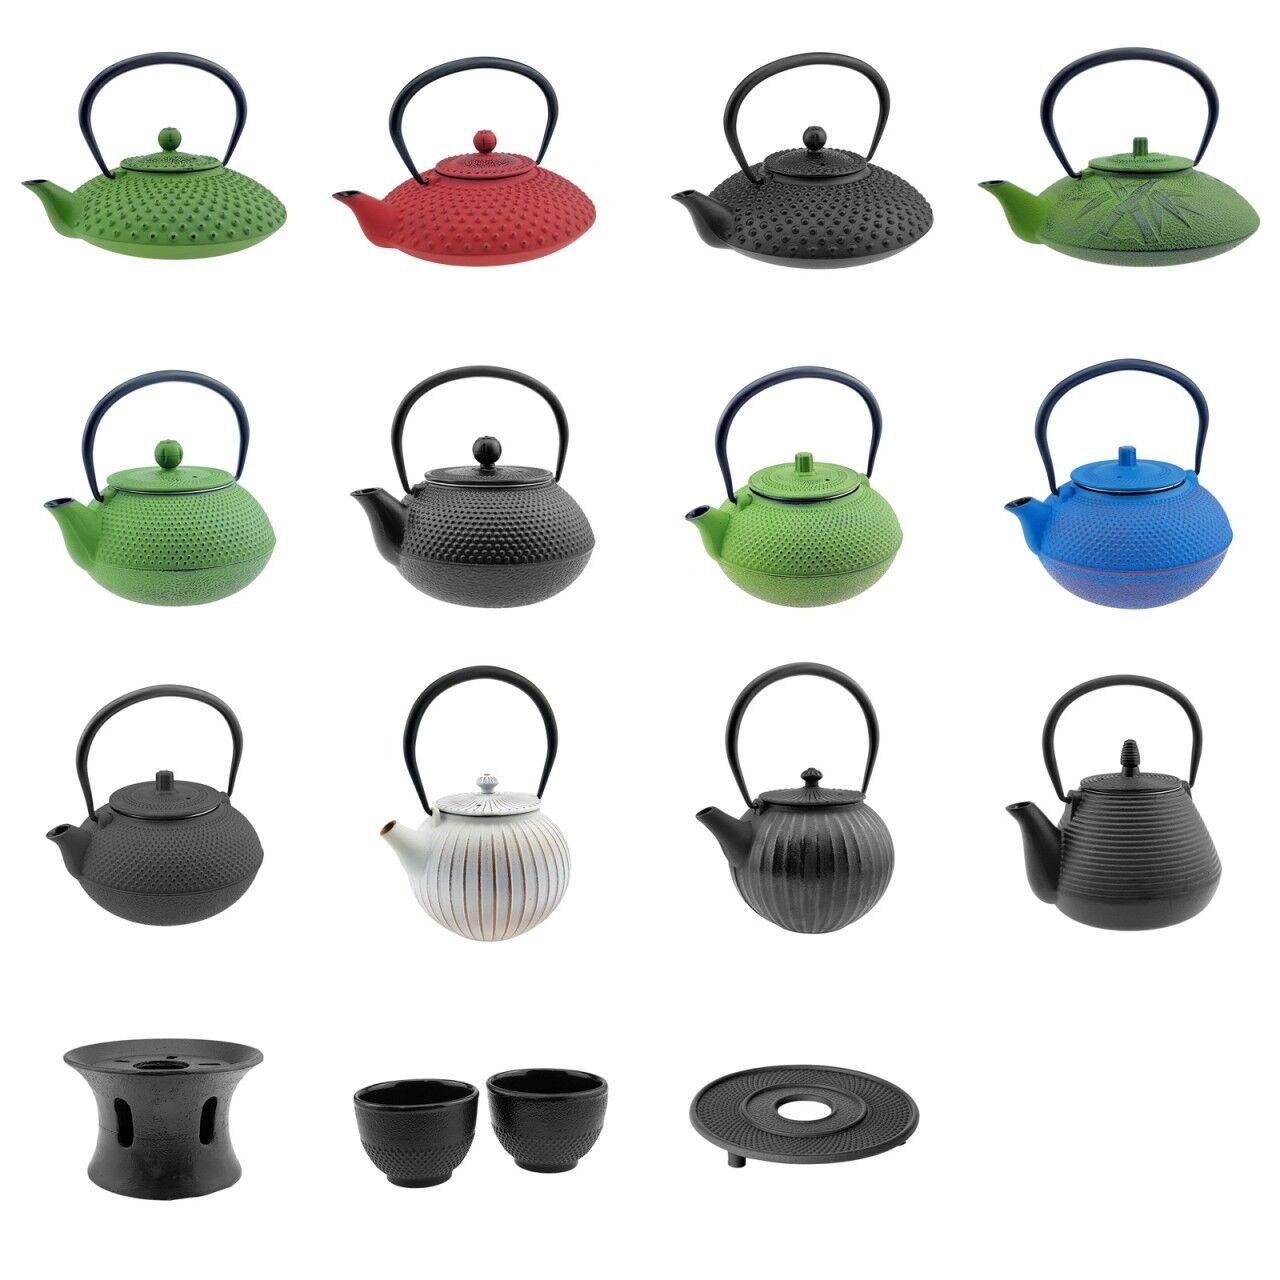 Asiatische Gusseisen Teekanne inkl. Teesieb Kaffeekanne Kanne Tassen Stövchen